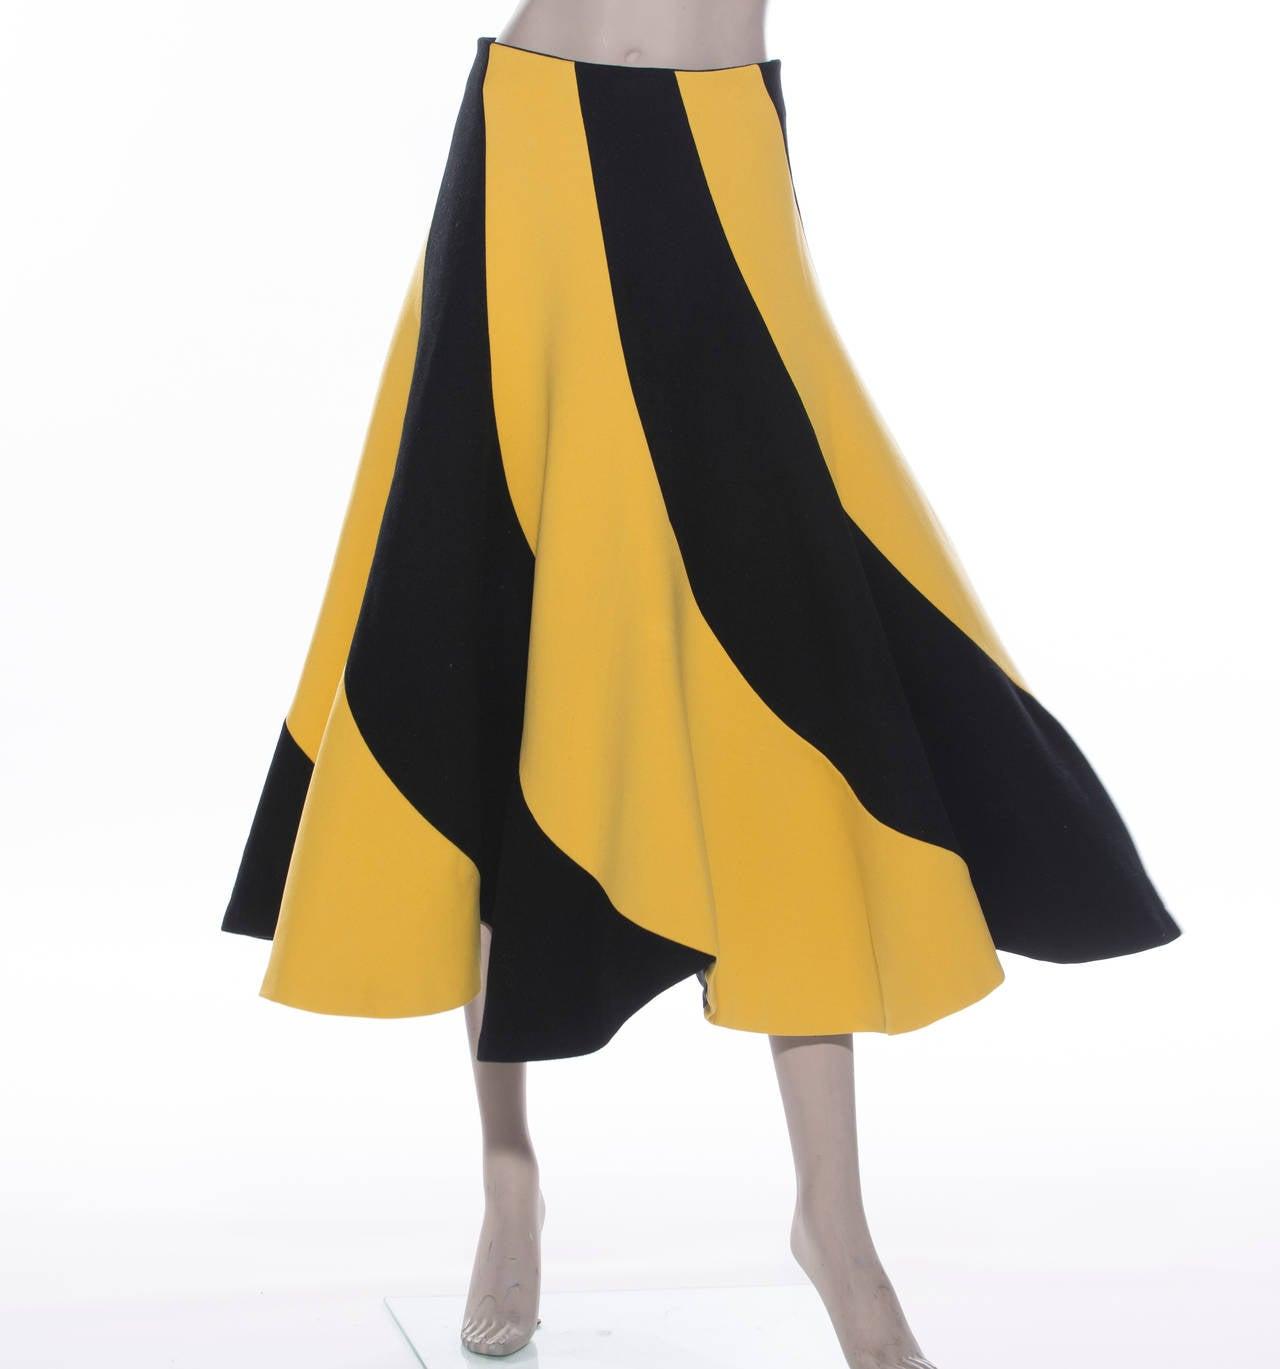 Yohji Yamamoto Circle Skirt, Circa 1990's 5